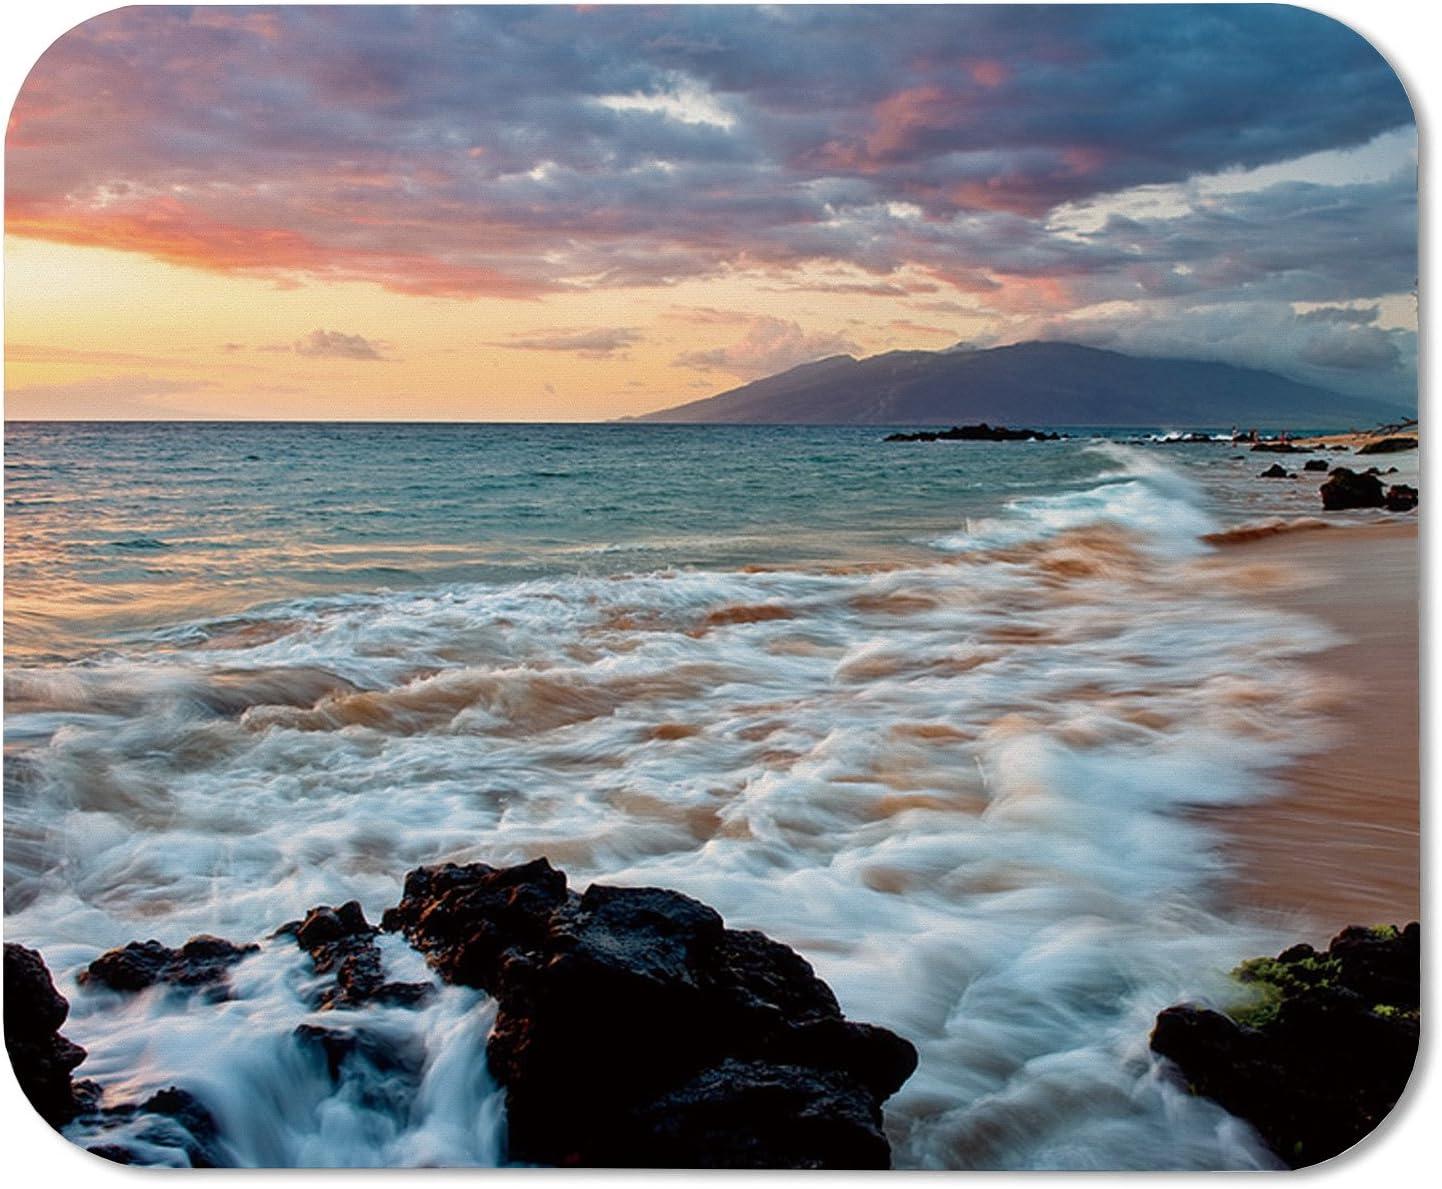 Wailea Makena Beach Maui Hawaii Beautiful Sunset Sea Waves Clouds Mouse Pad Mat